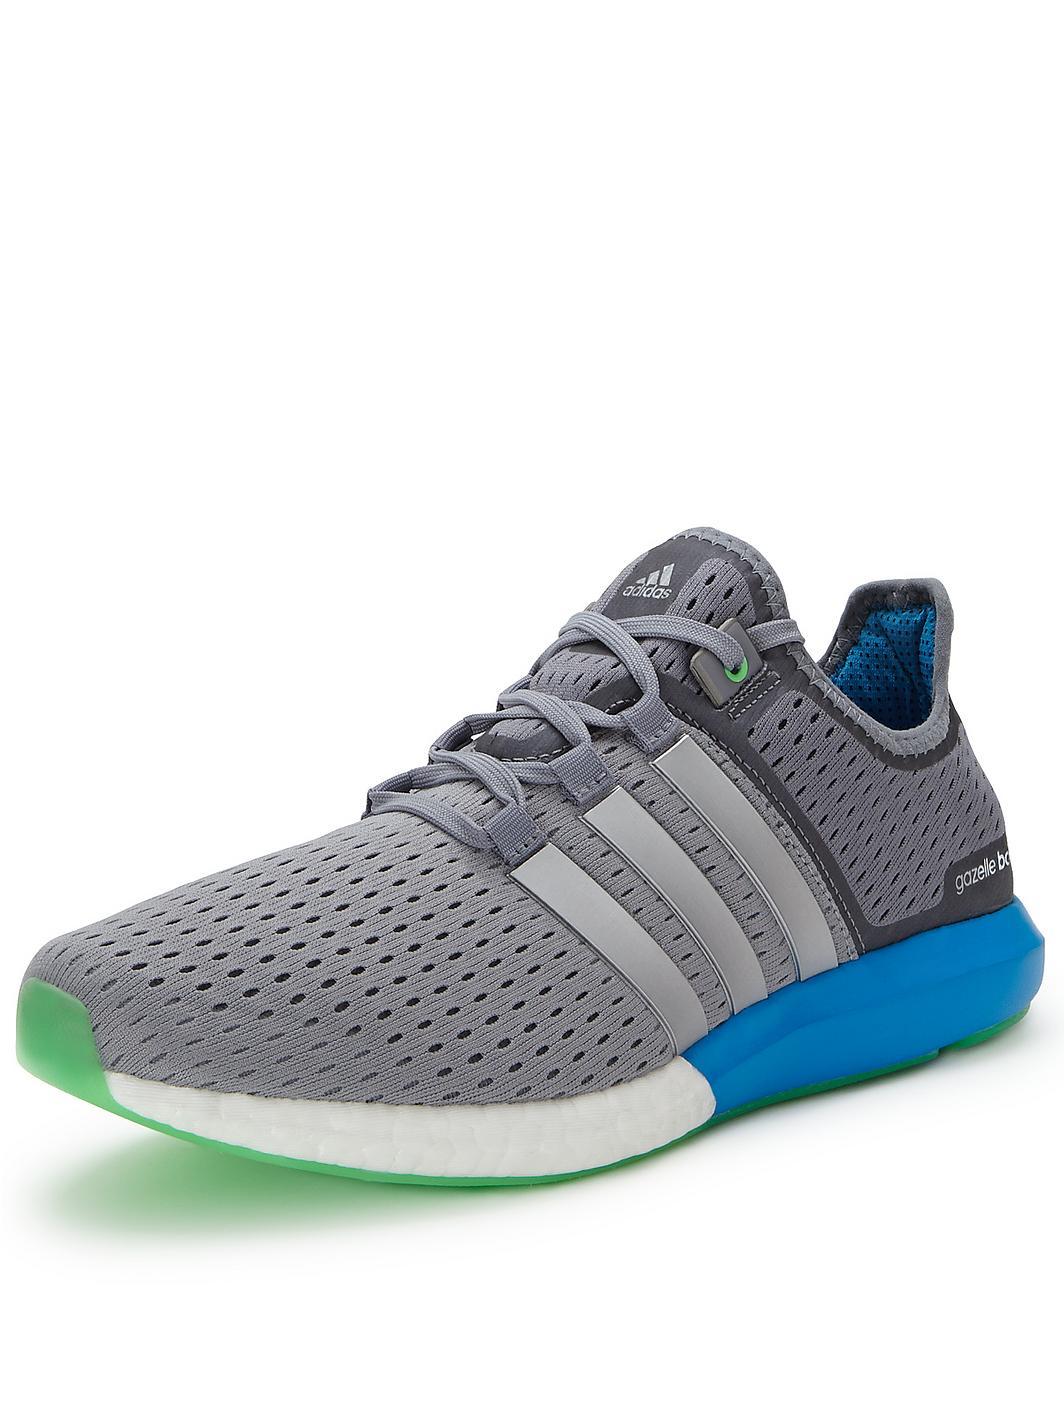 Adidas Mens Trainers Adidas cc Gazelle Boost g Mens